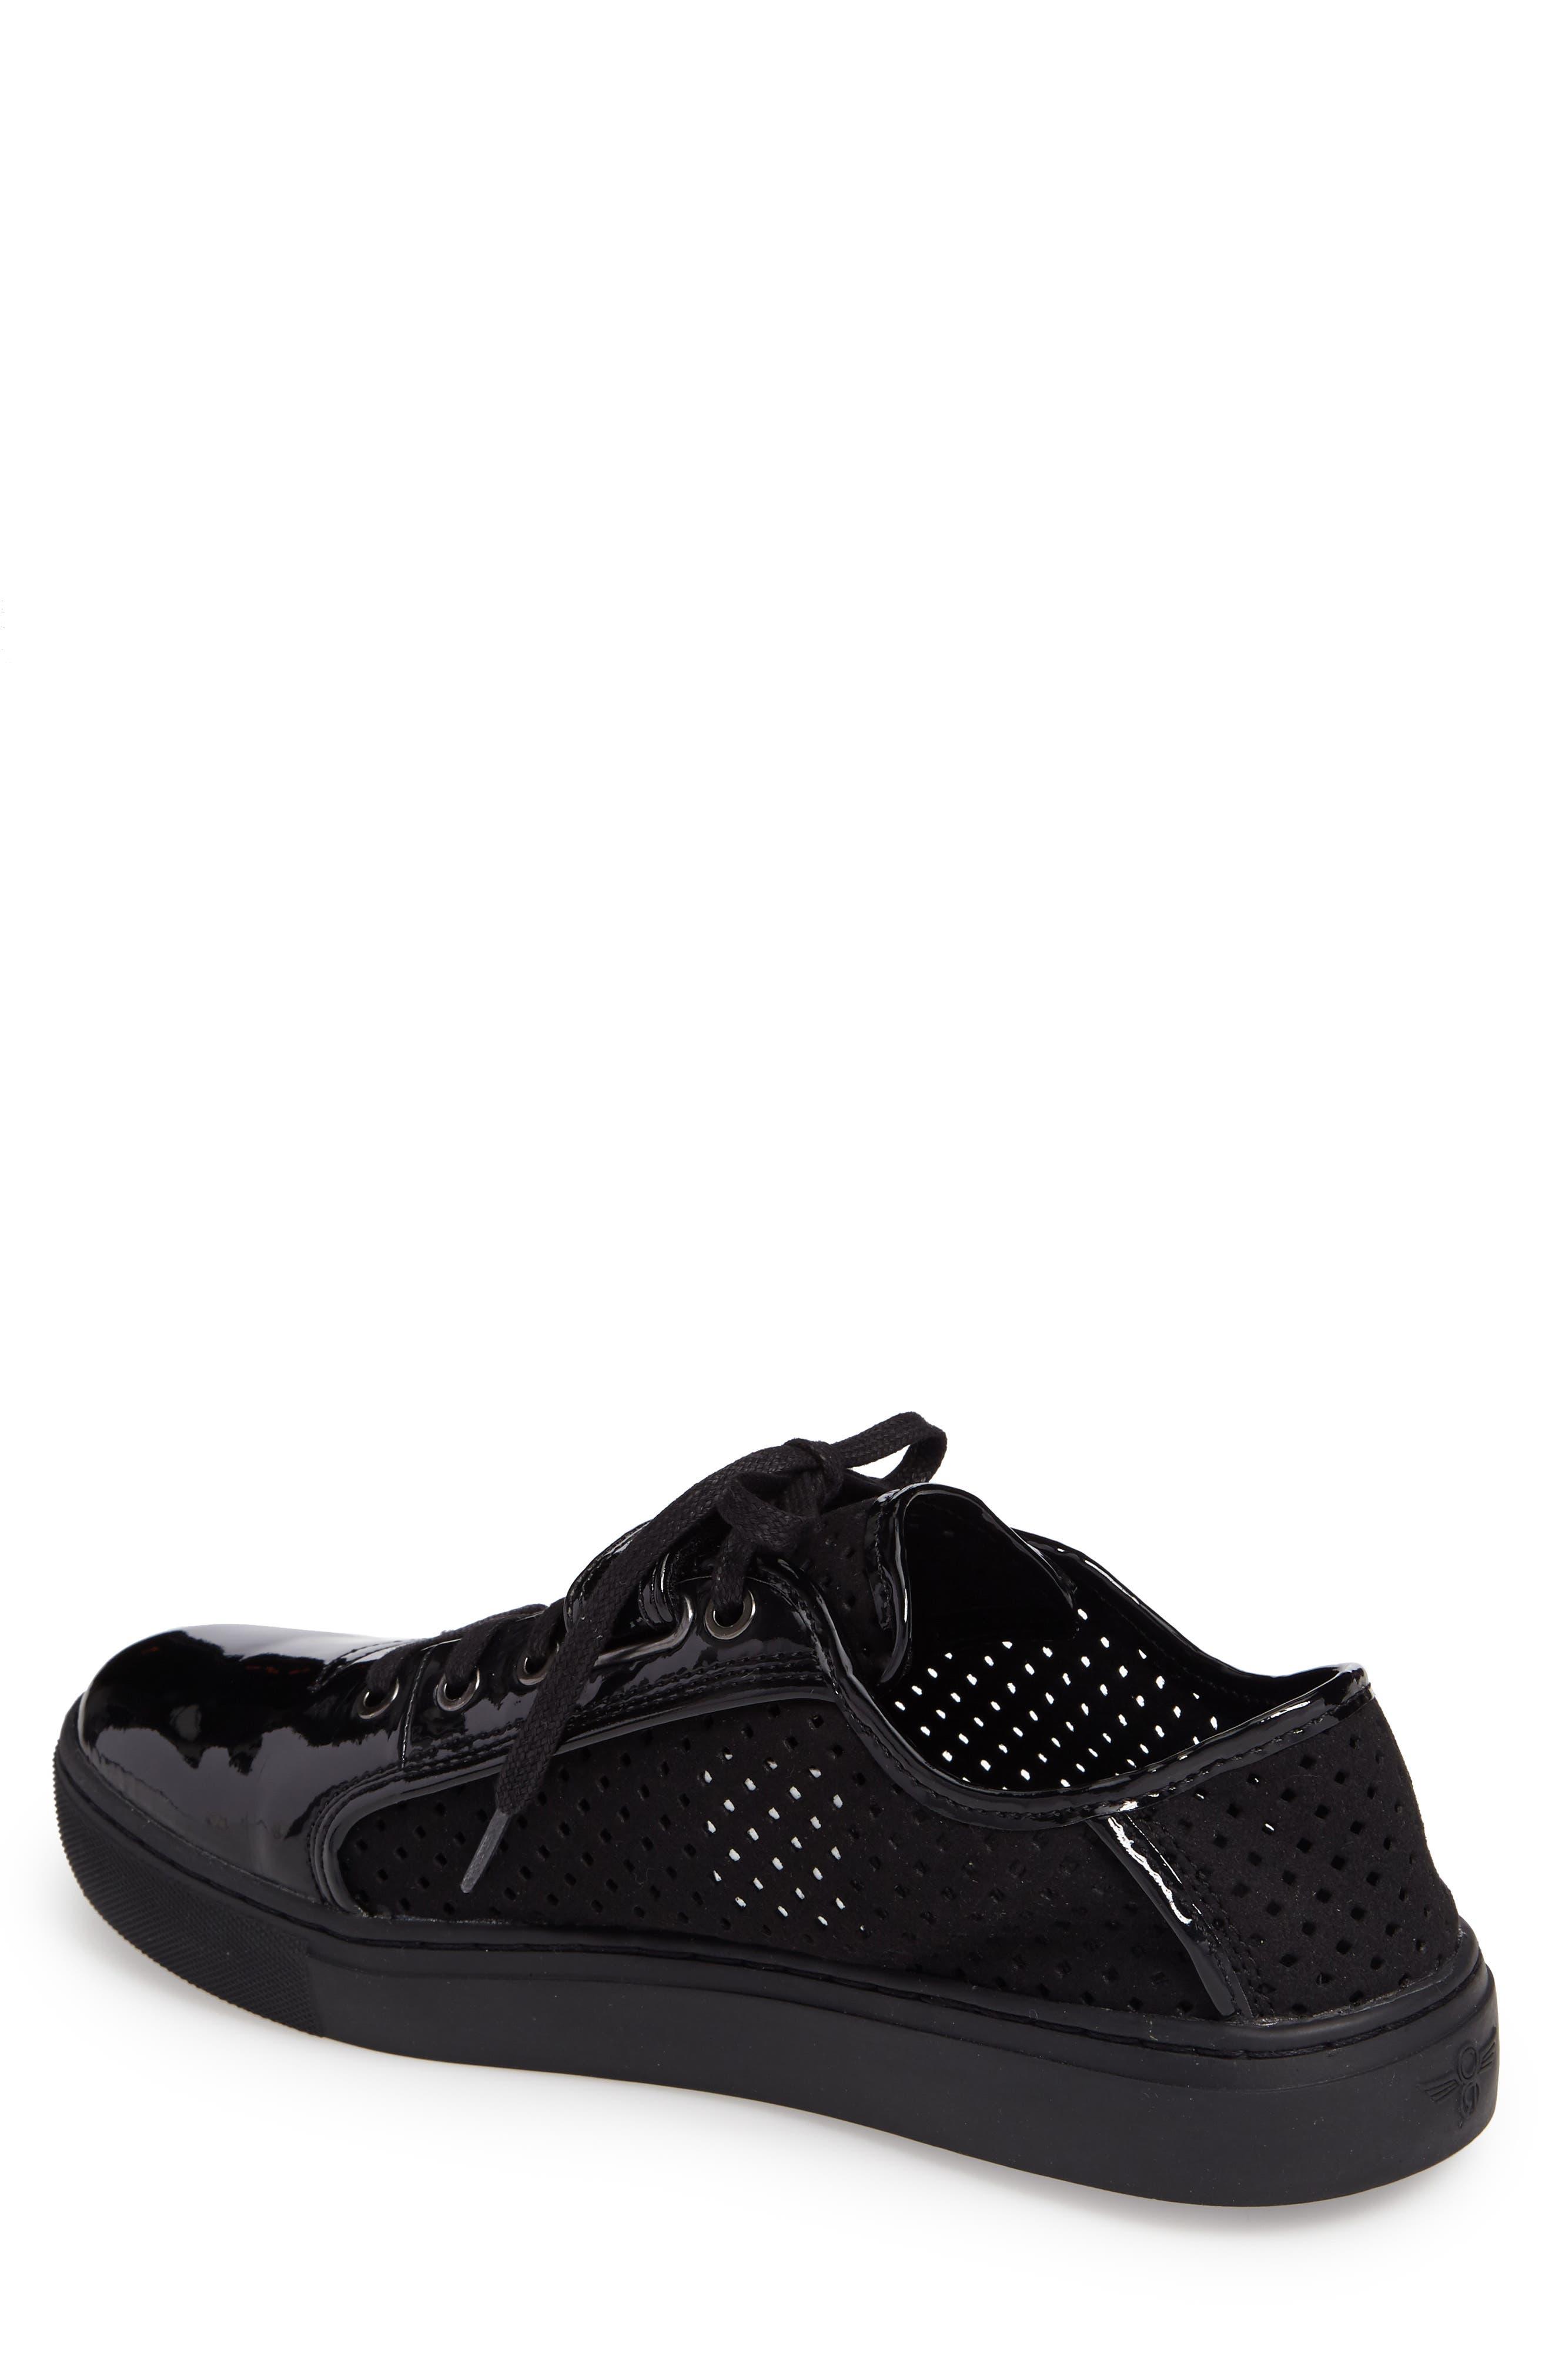 Pagno Sneaker,                             Alternate thumbnail 2, color,                             001